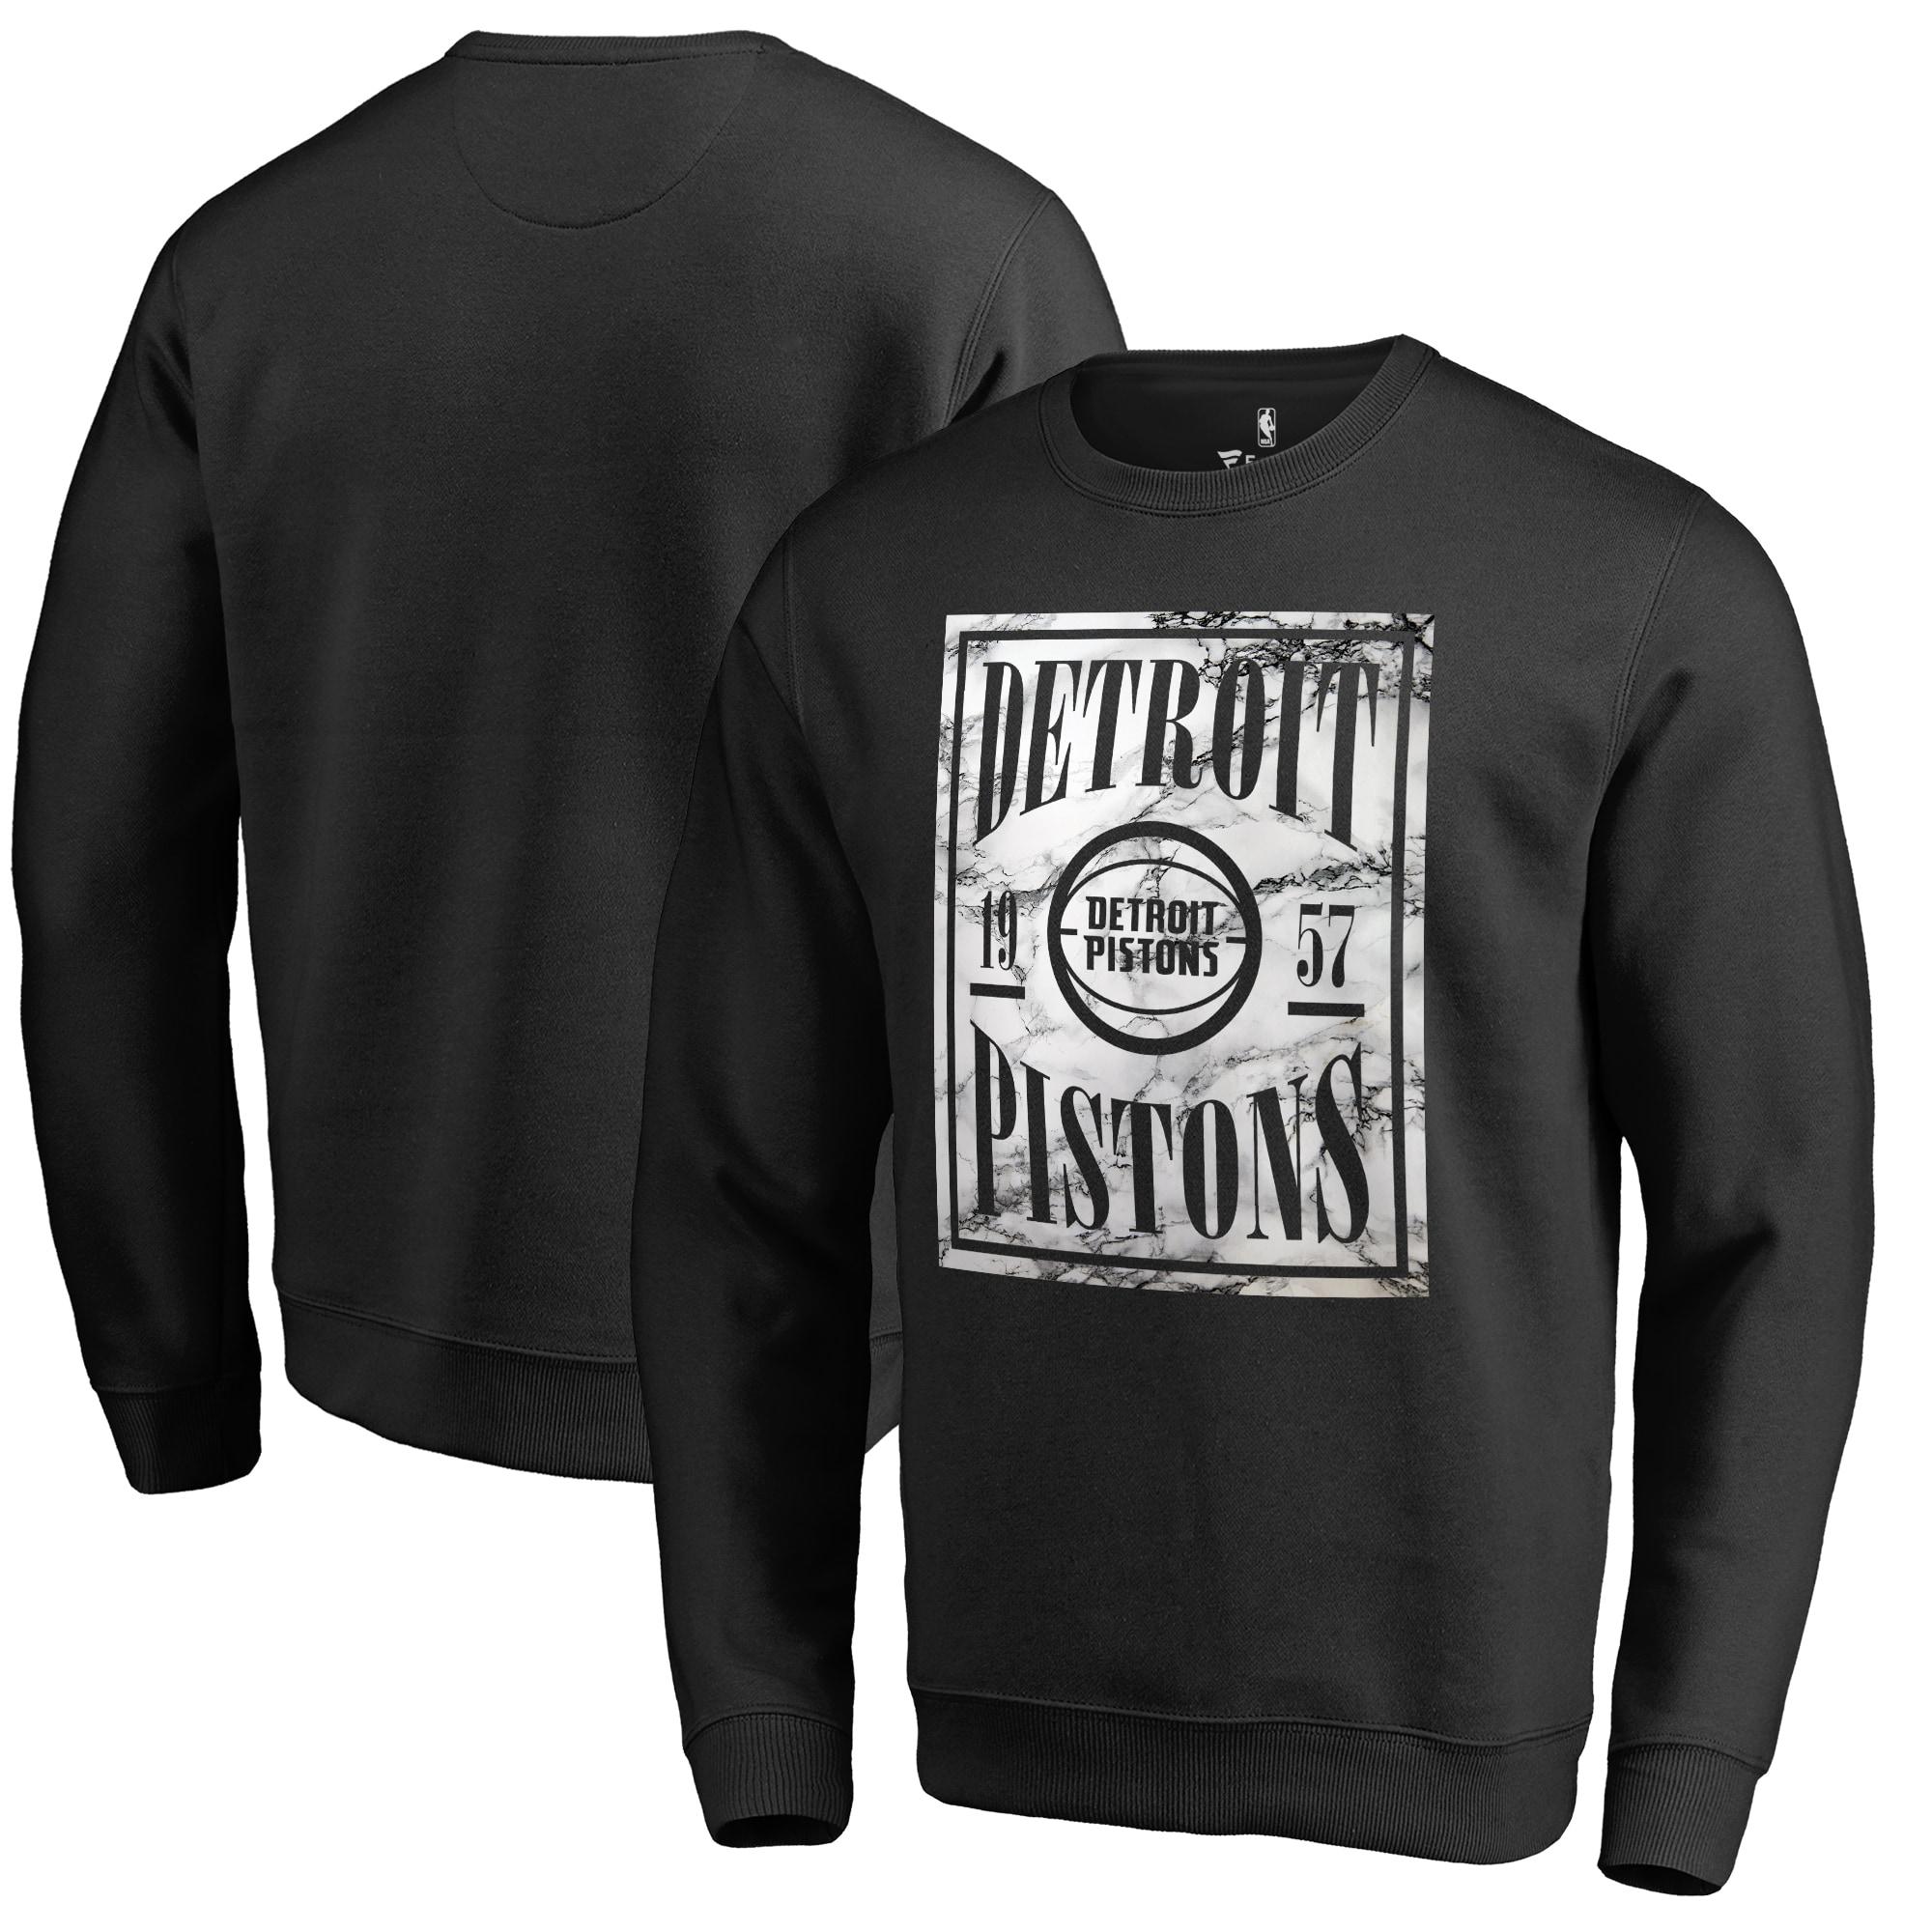 Detroit Pistons Fanatics Branded Court Vision Crew Sweatshirt - Black